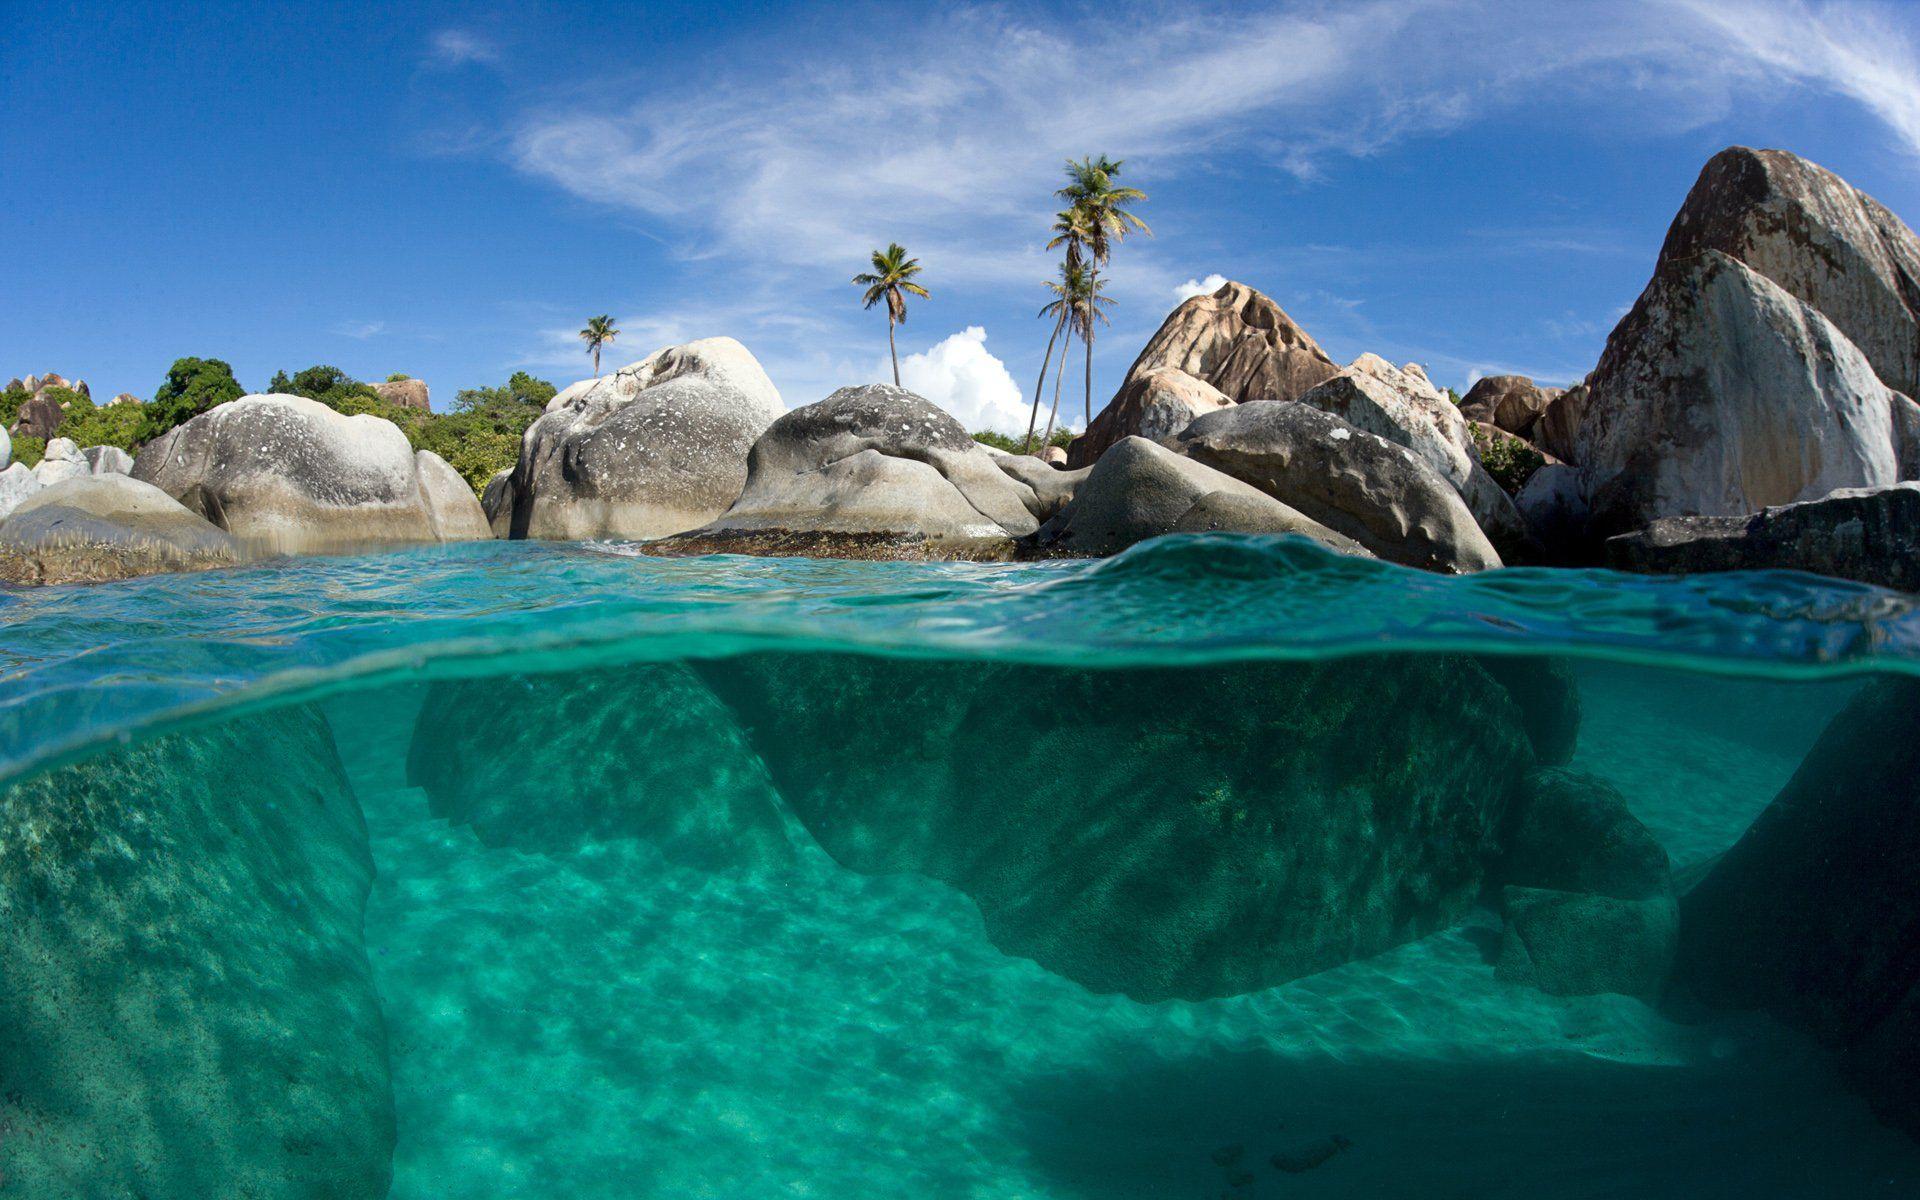 pictures of underwater